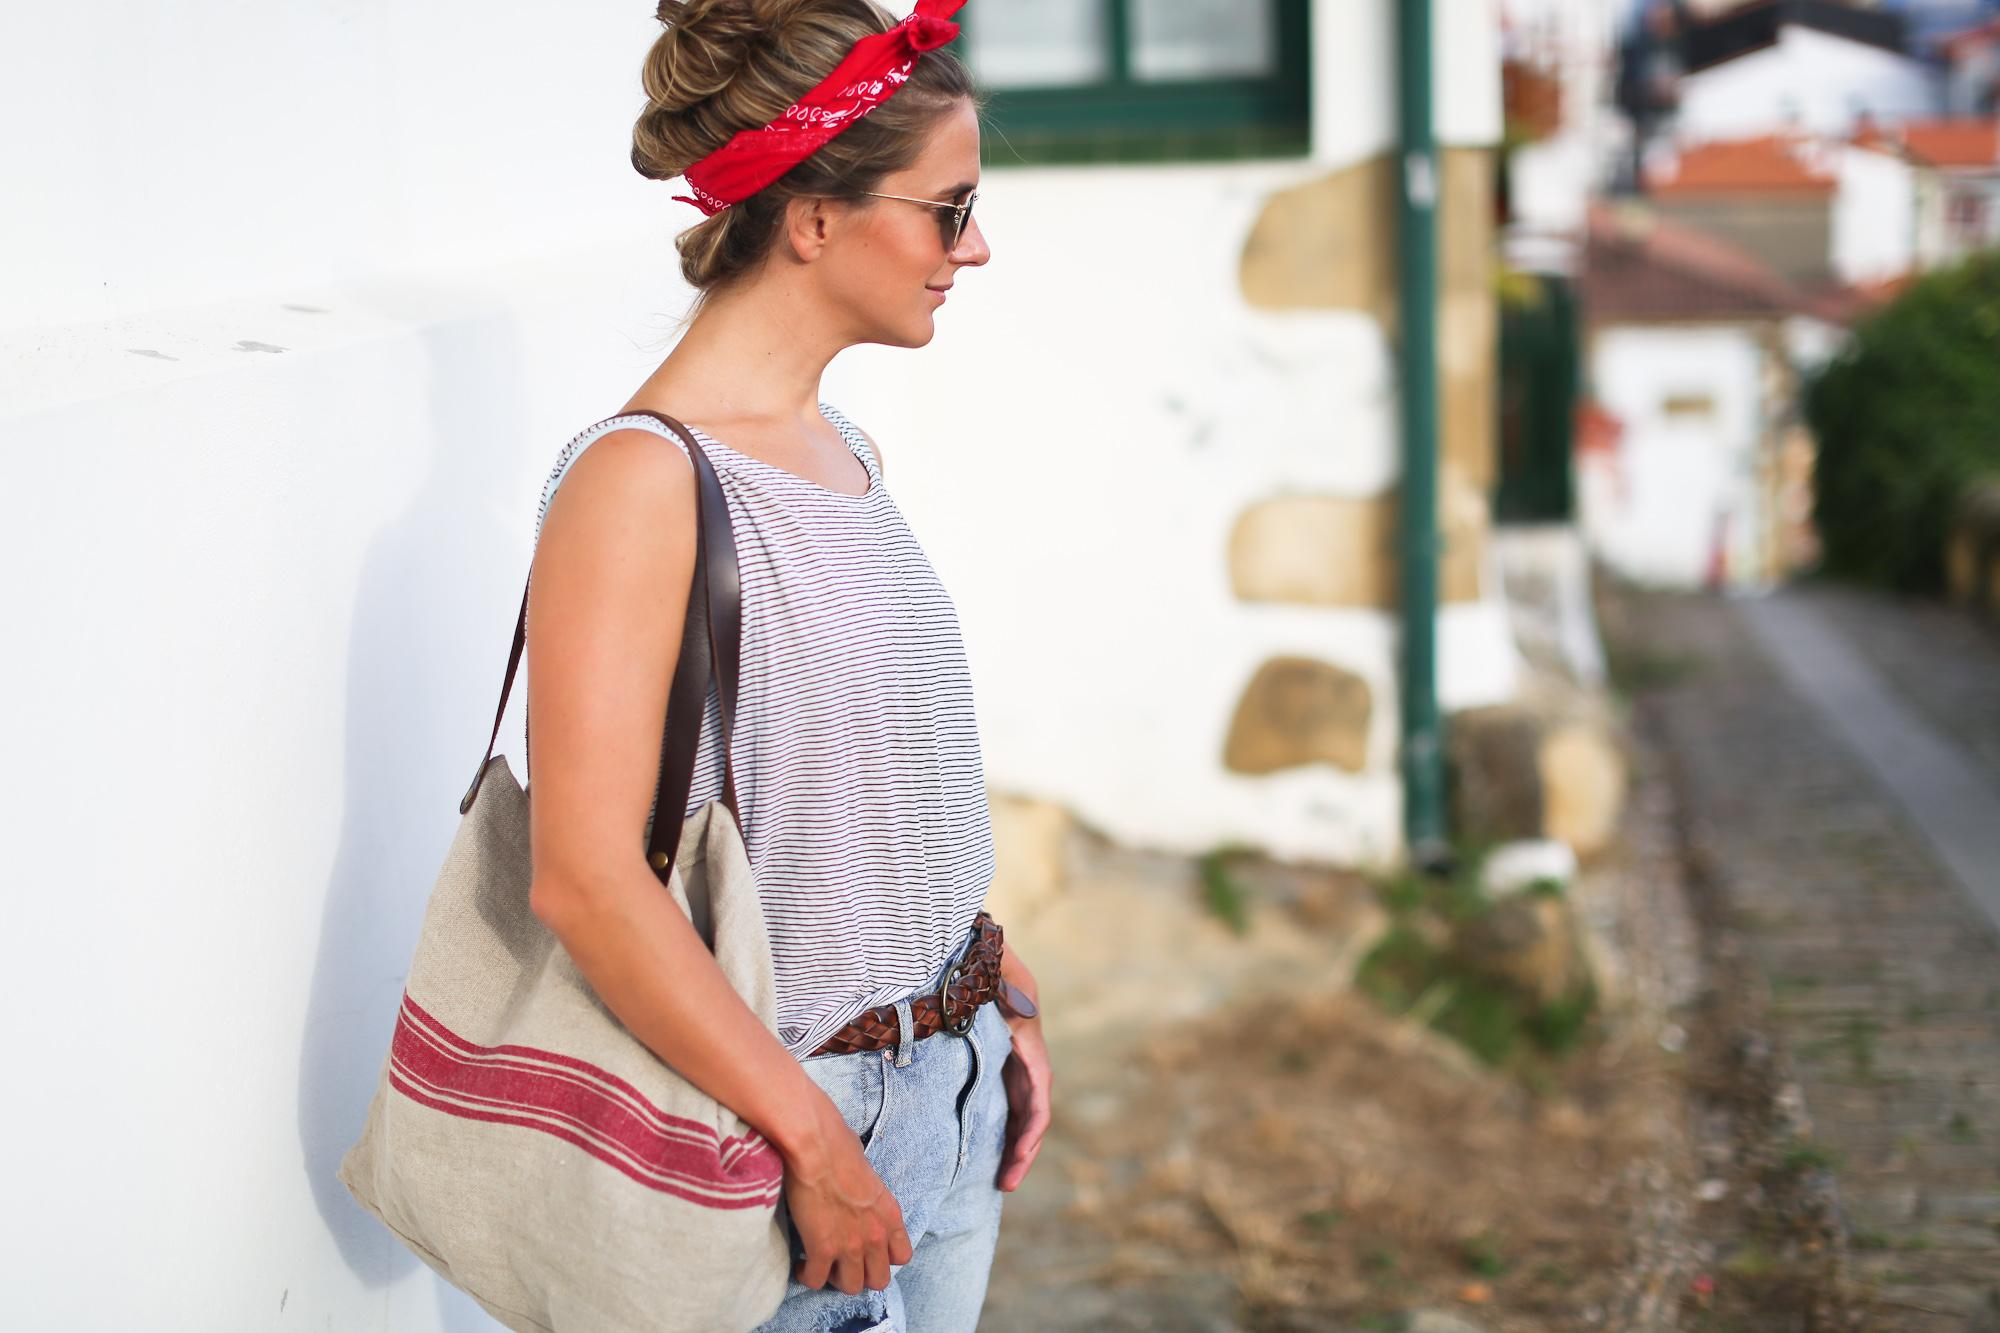 Clochet_streetstyle_suiteblanco_boyfriend_jeans_bandana_scarf_mg_linen_bag-5